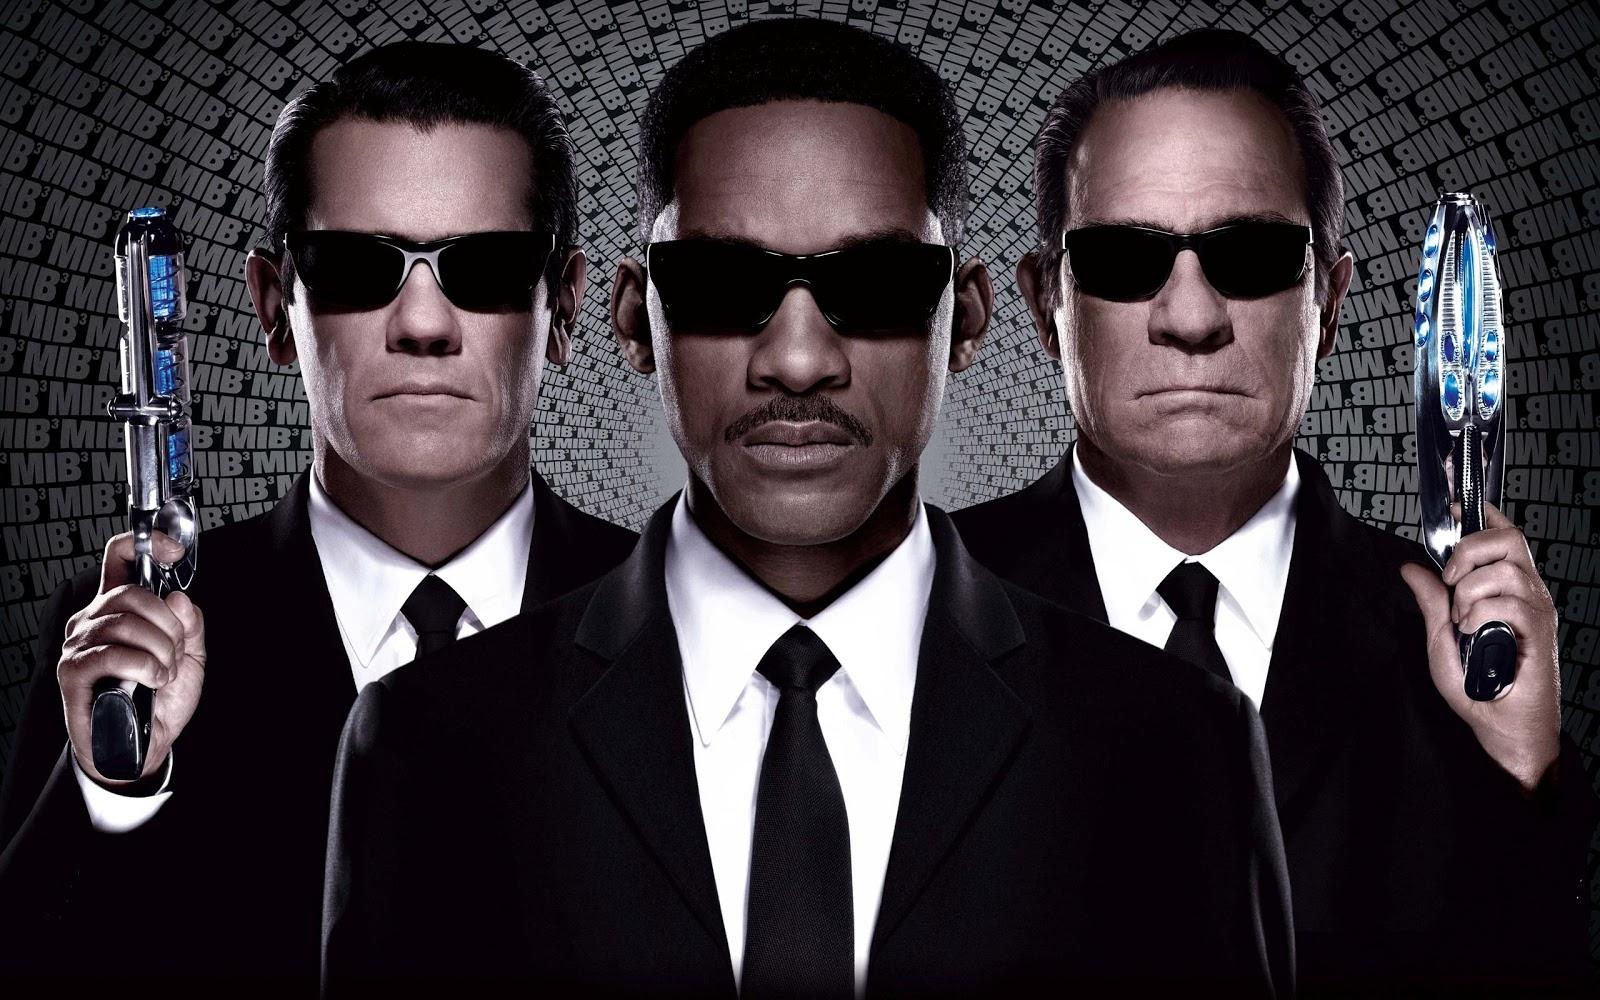 http://2.bp.blogspot.com/-4DKNE6CK6aY/UJCSZO55hzI/AAAAAAAAG2o/lW0K1YPS03U/s1600/Men-in-Black-3.jpg